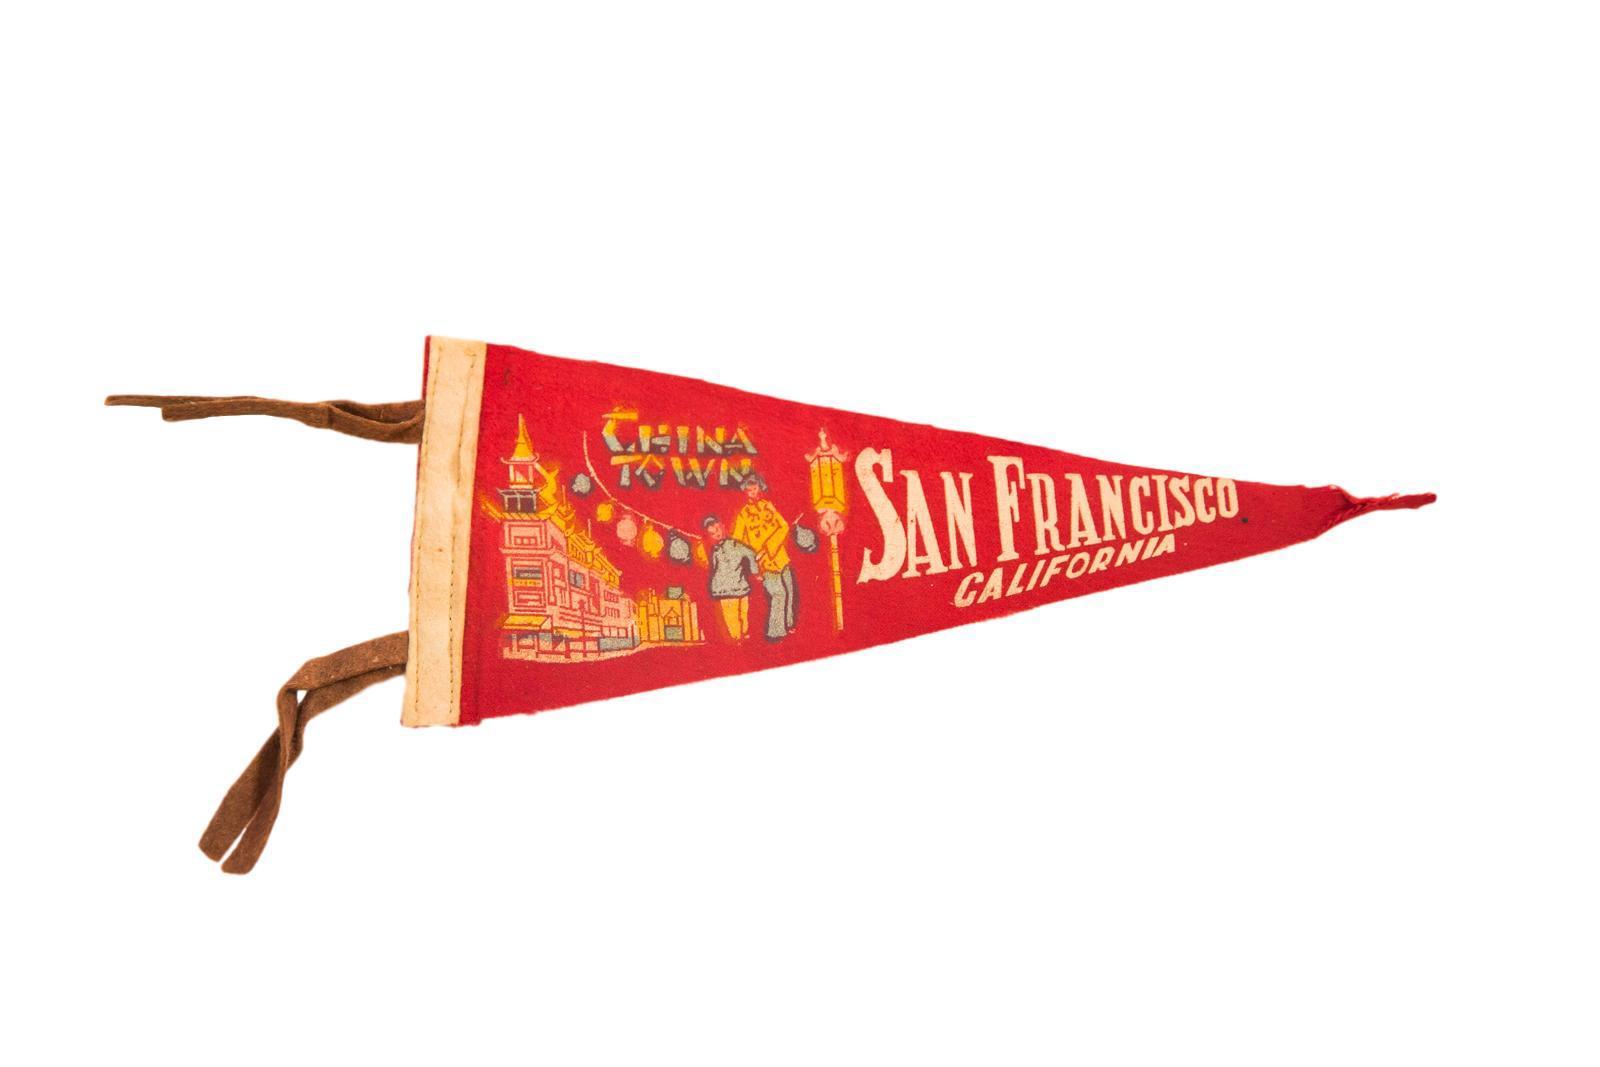 Charming Vintage San Francisco California China Town Felt Flag Pennant   Image 4 Of 4